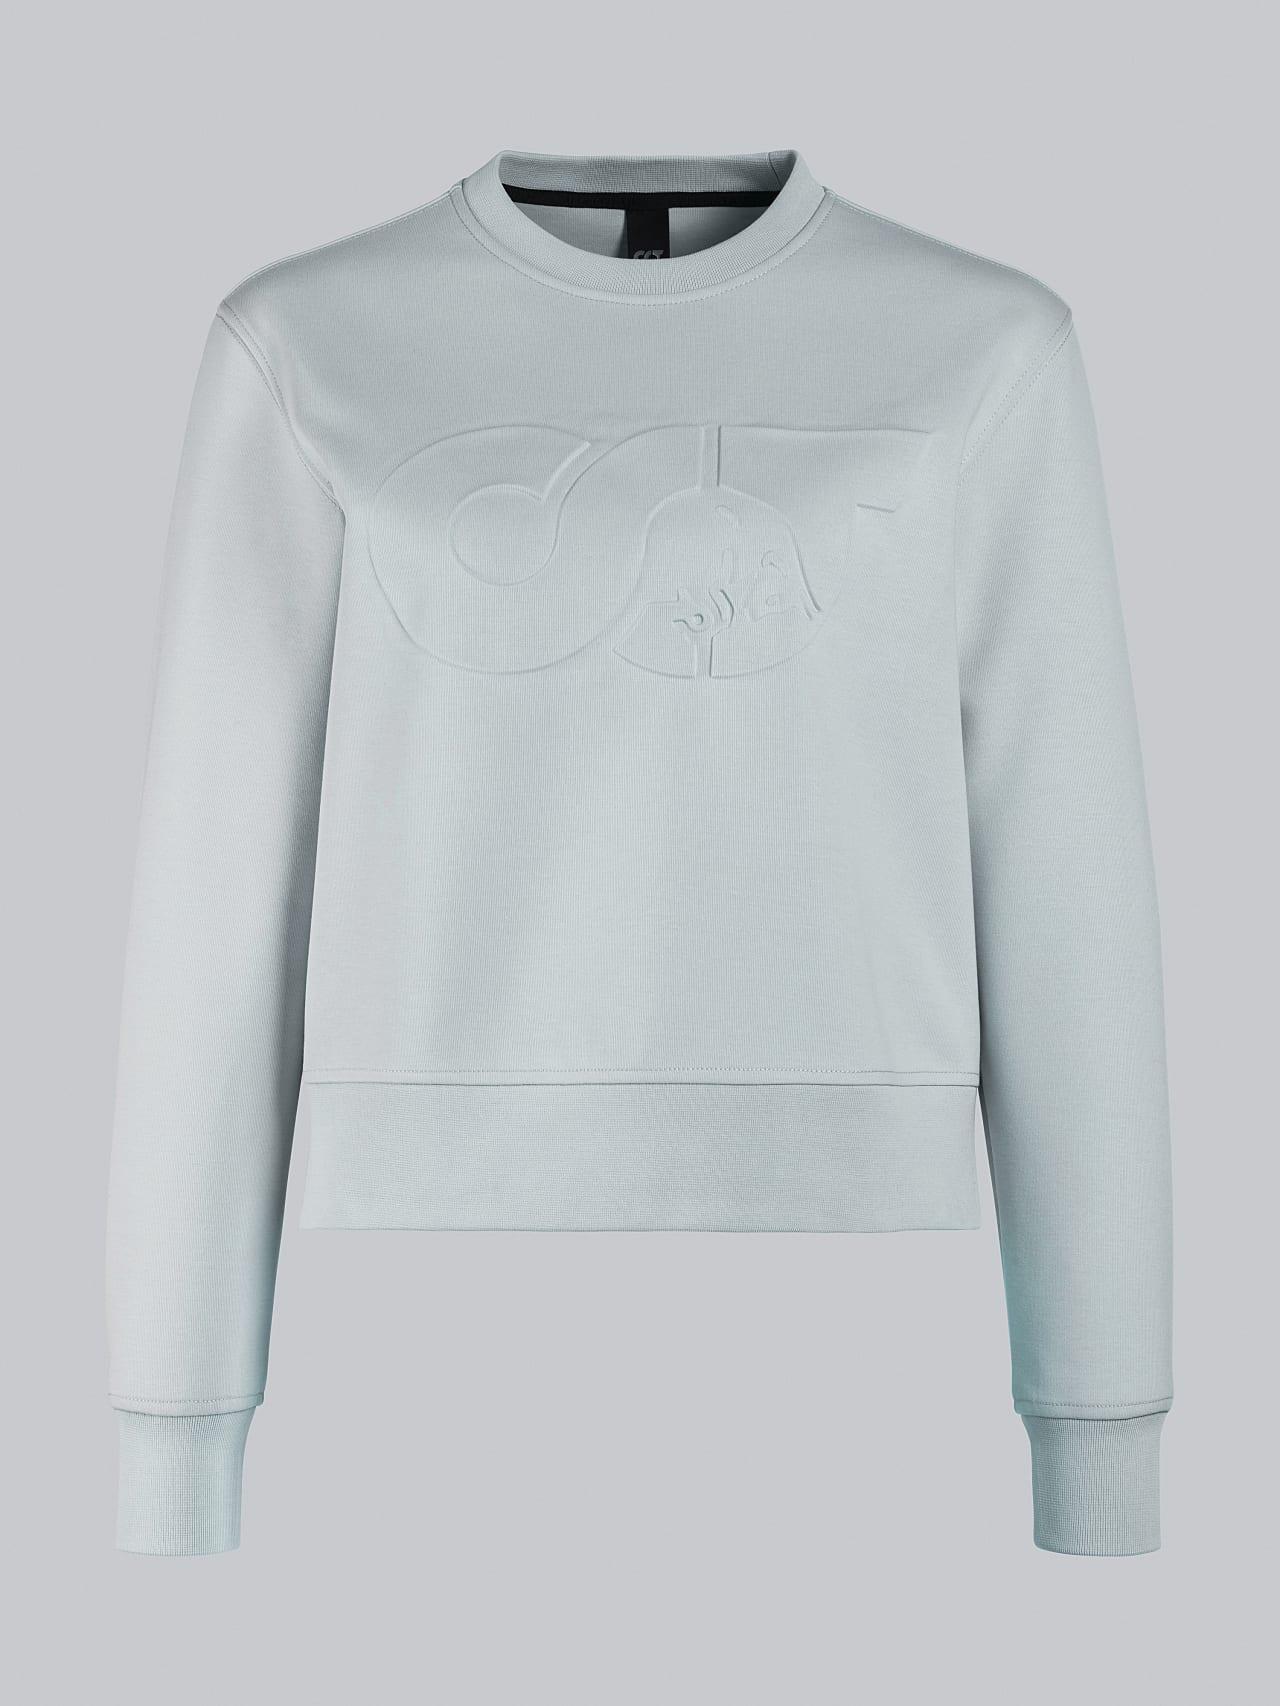 SHINT V1.Y5.02 Premium Logo Sweater Pale Blue  Back Alpha Tauri